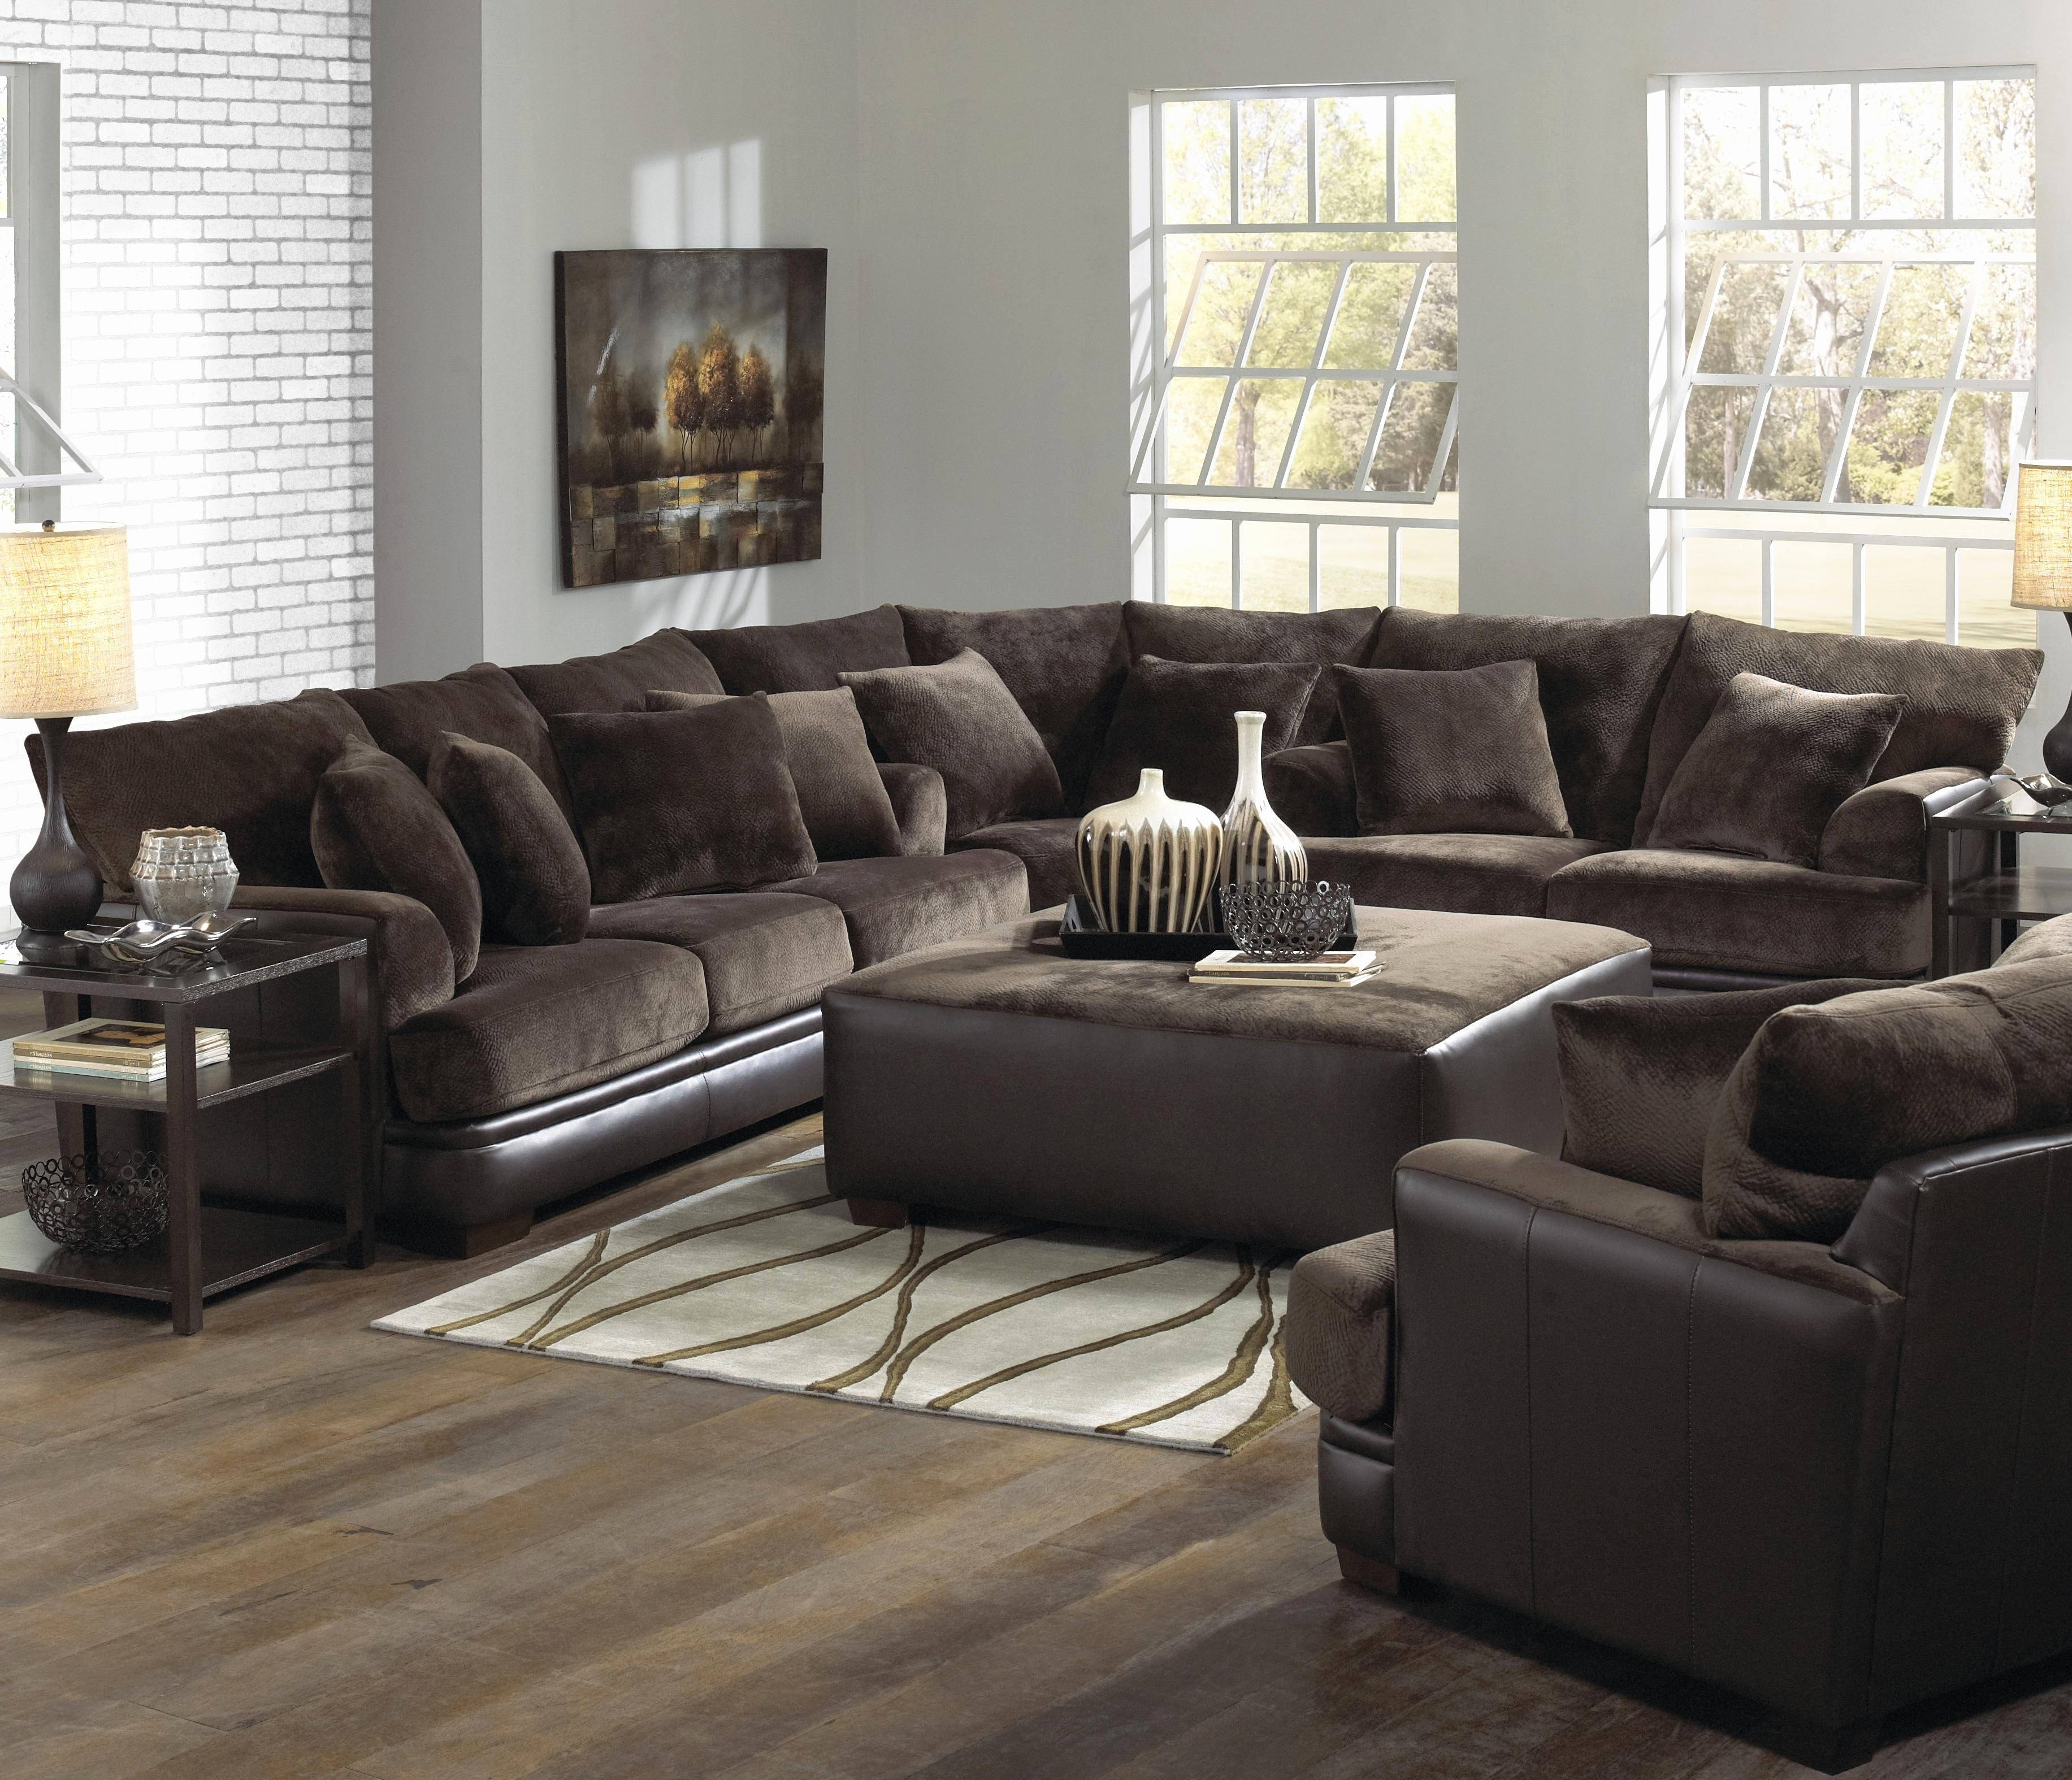 Beautiful Large U Shaped Sectional Sofa 2018 – Couches Ideas Inside Big U Shaped Sectionals (Image 1 of 10)